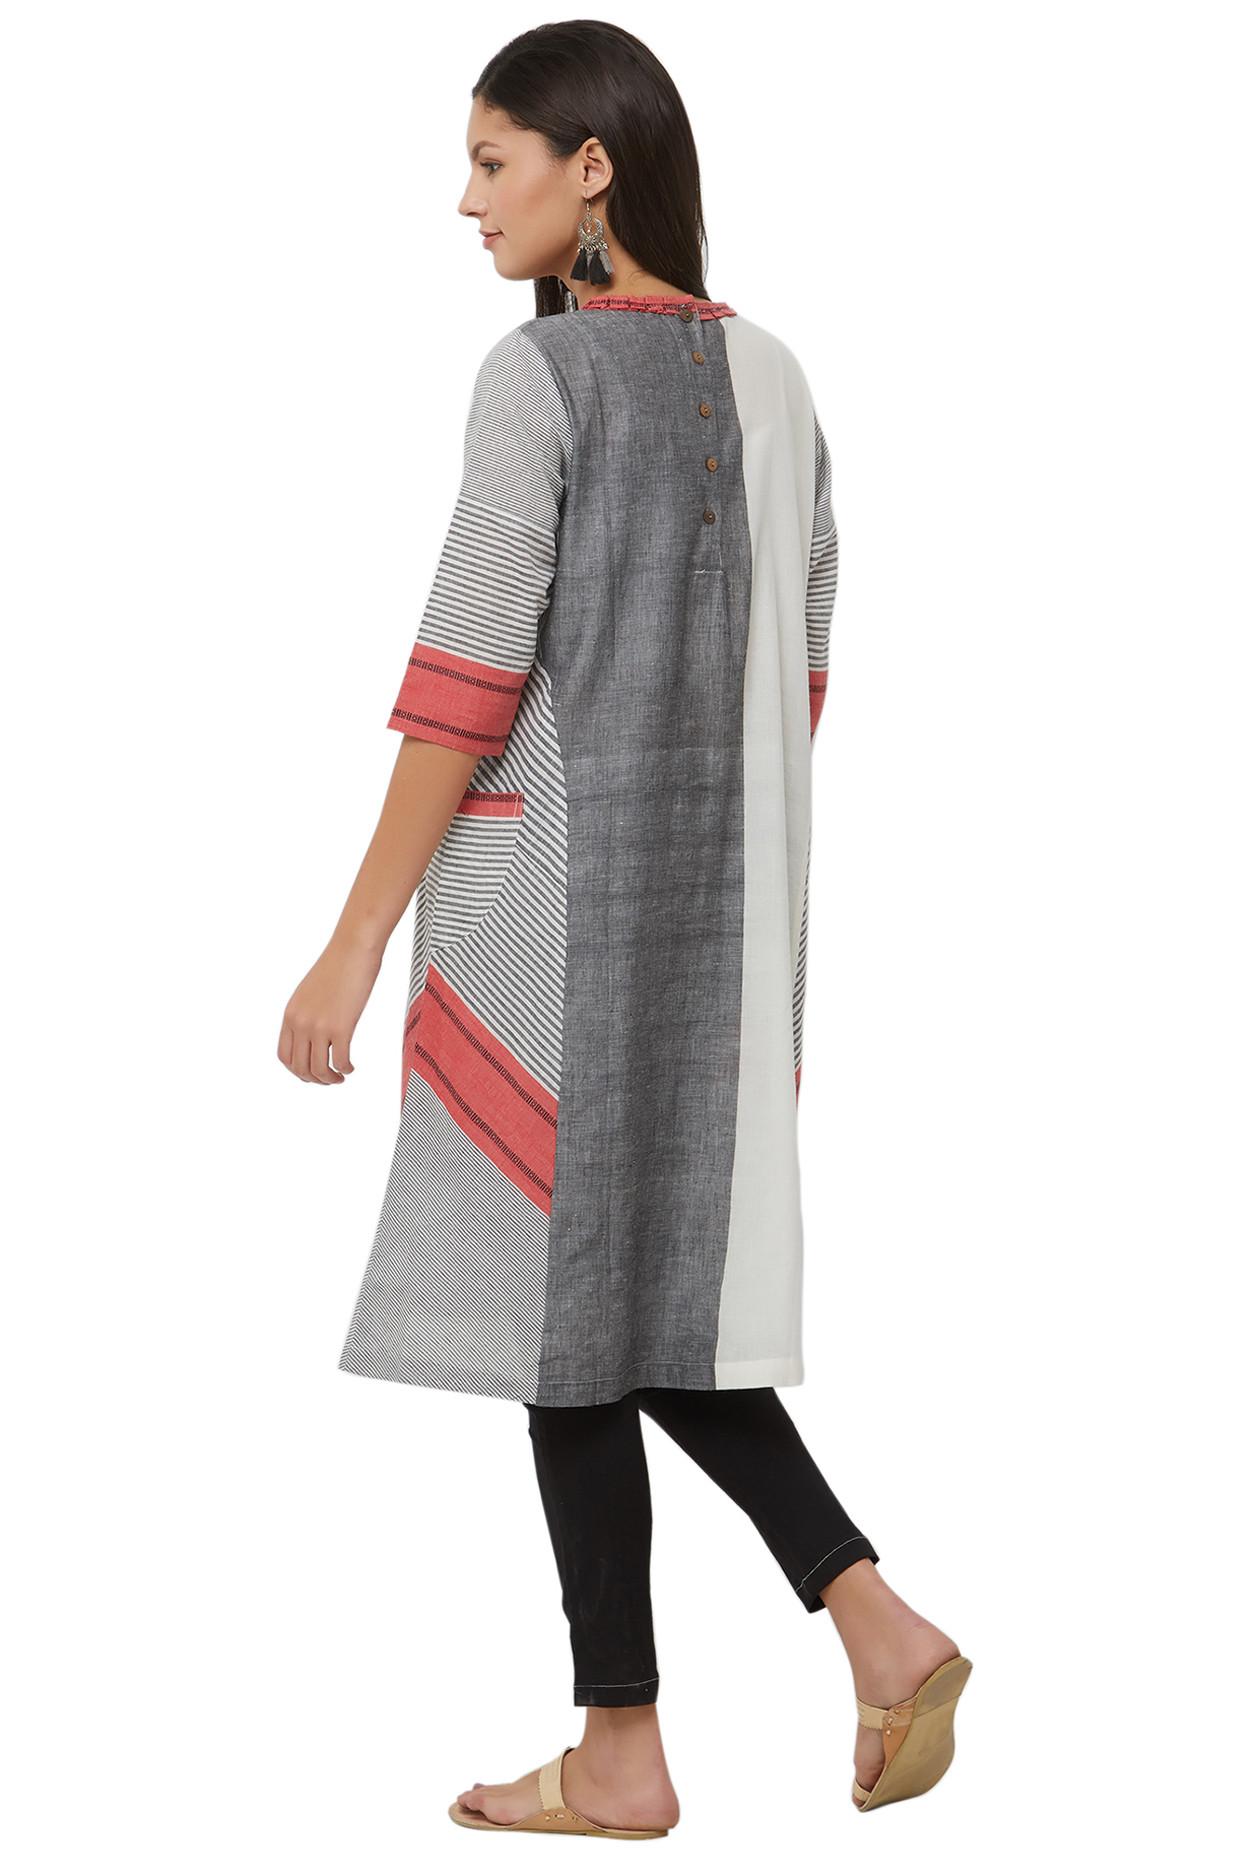 White & Grey Kurti In Handloom Cotton by House Of Idar